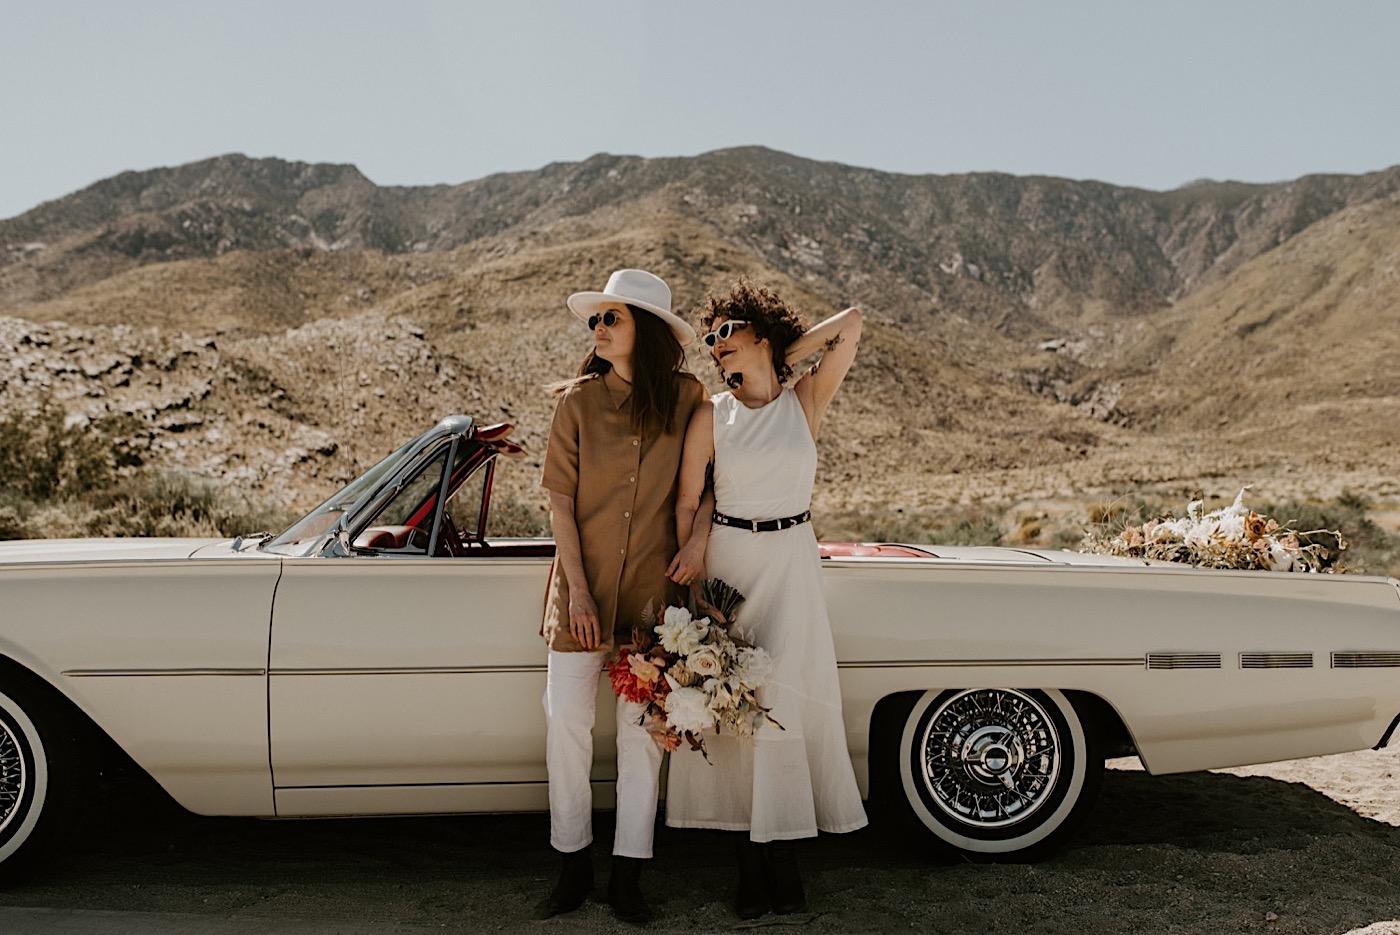 Palm Springs Elopement Los Angeles Elopement Photographer Desert Elopement 34